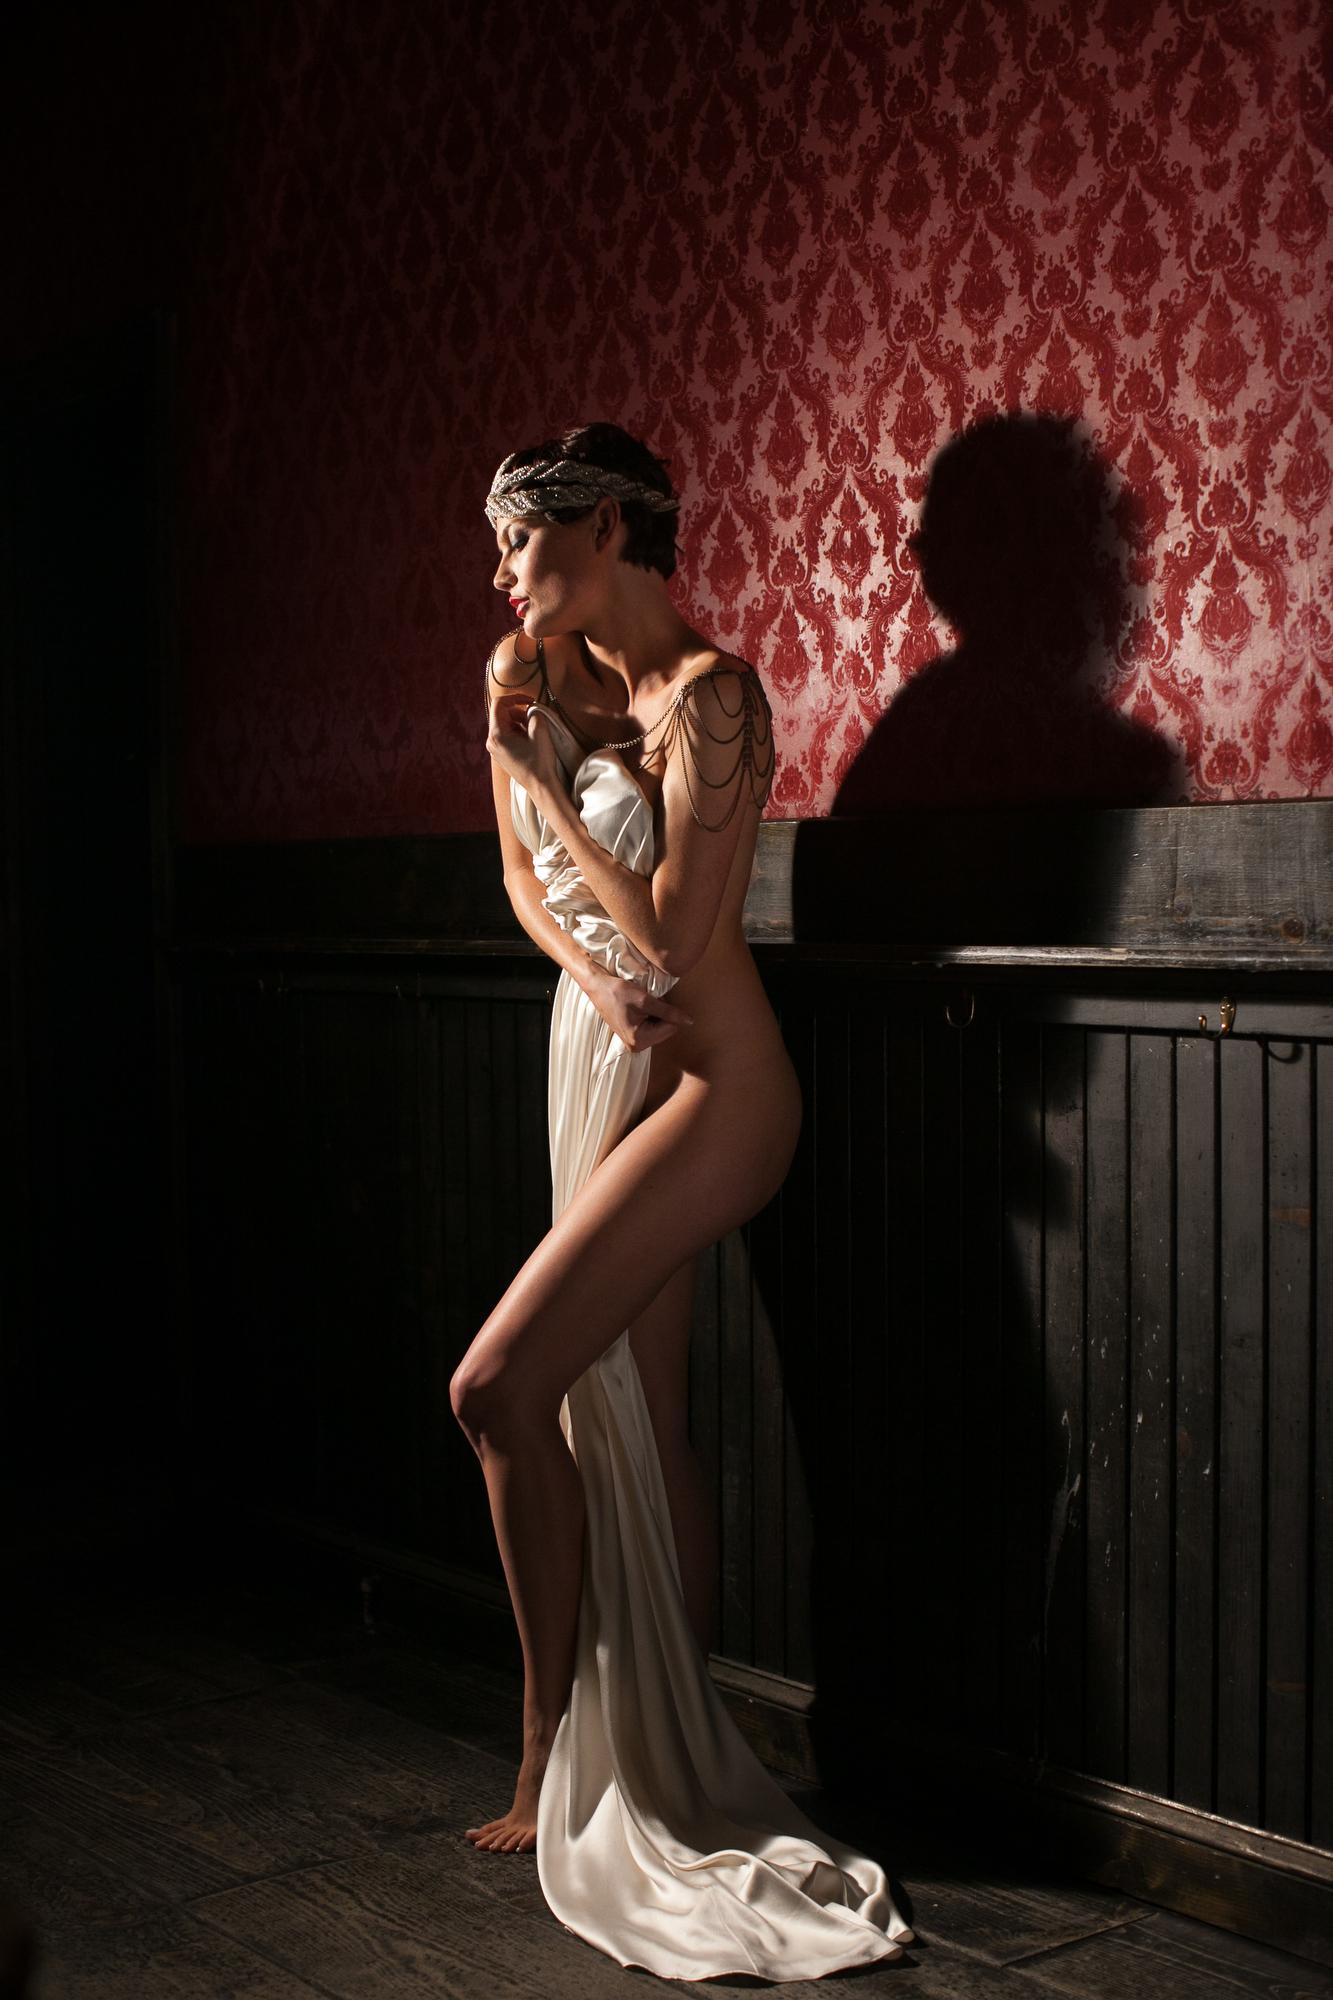 jennifer-skog-bridal-fashion-photographer-lifestyle-0022.jpg